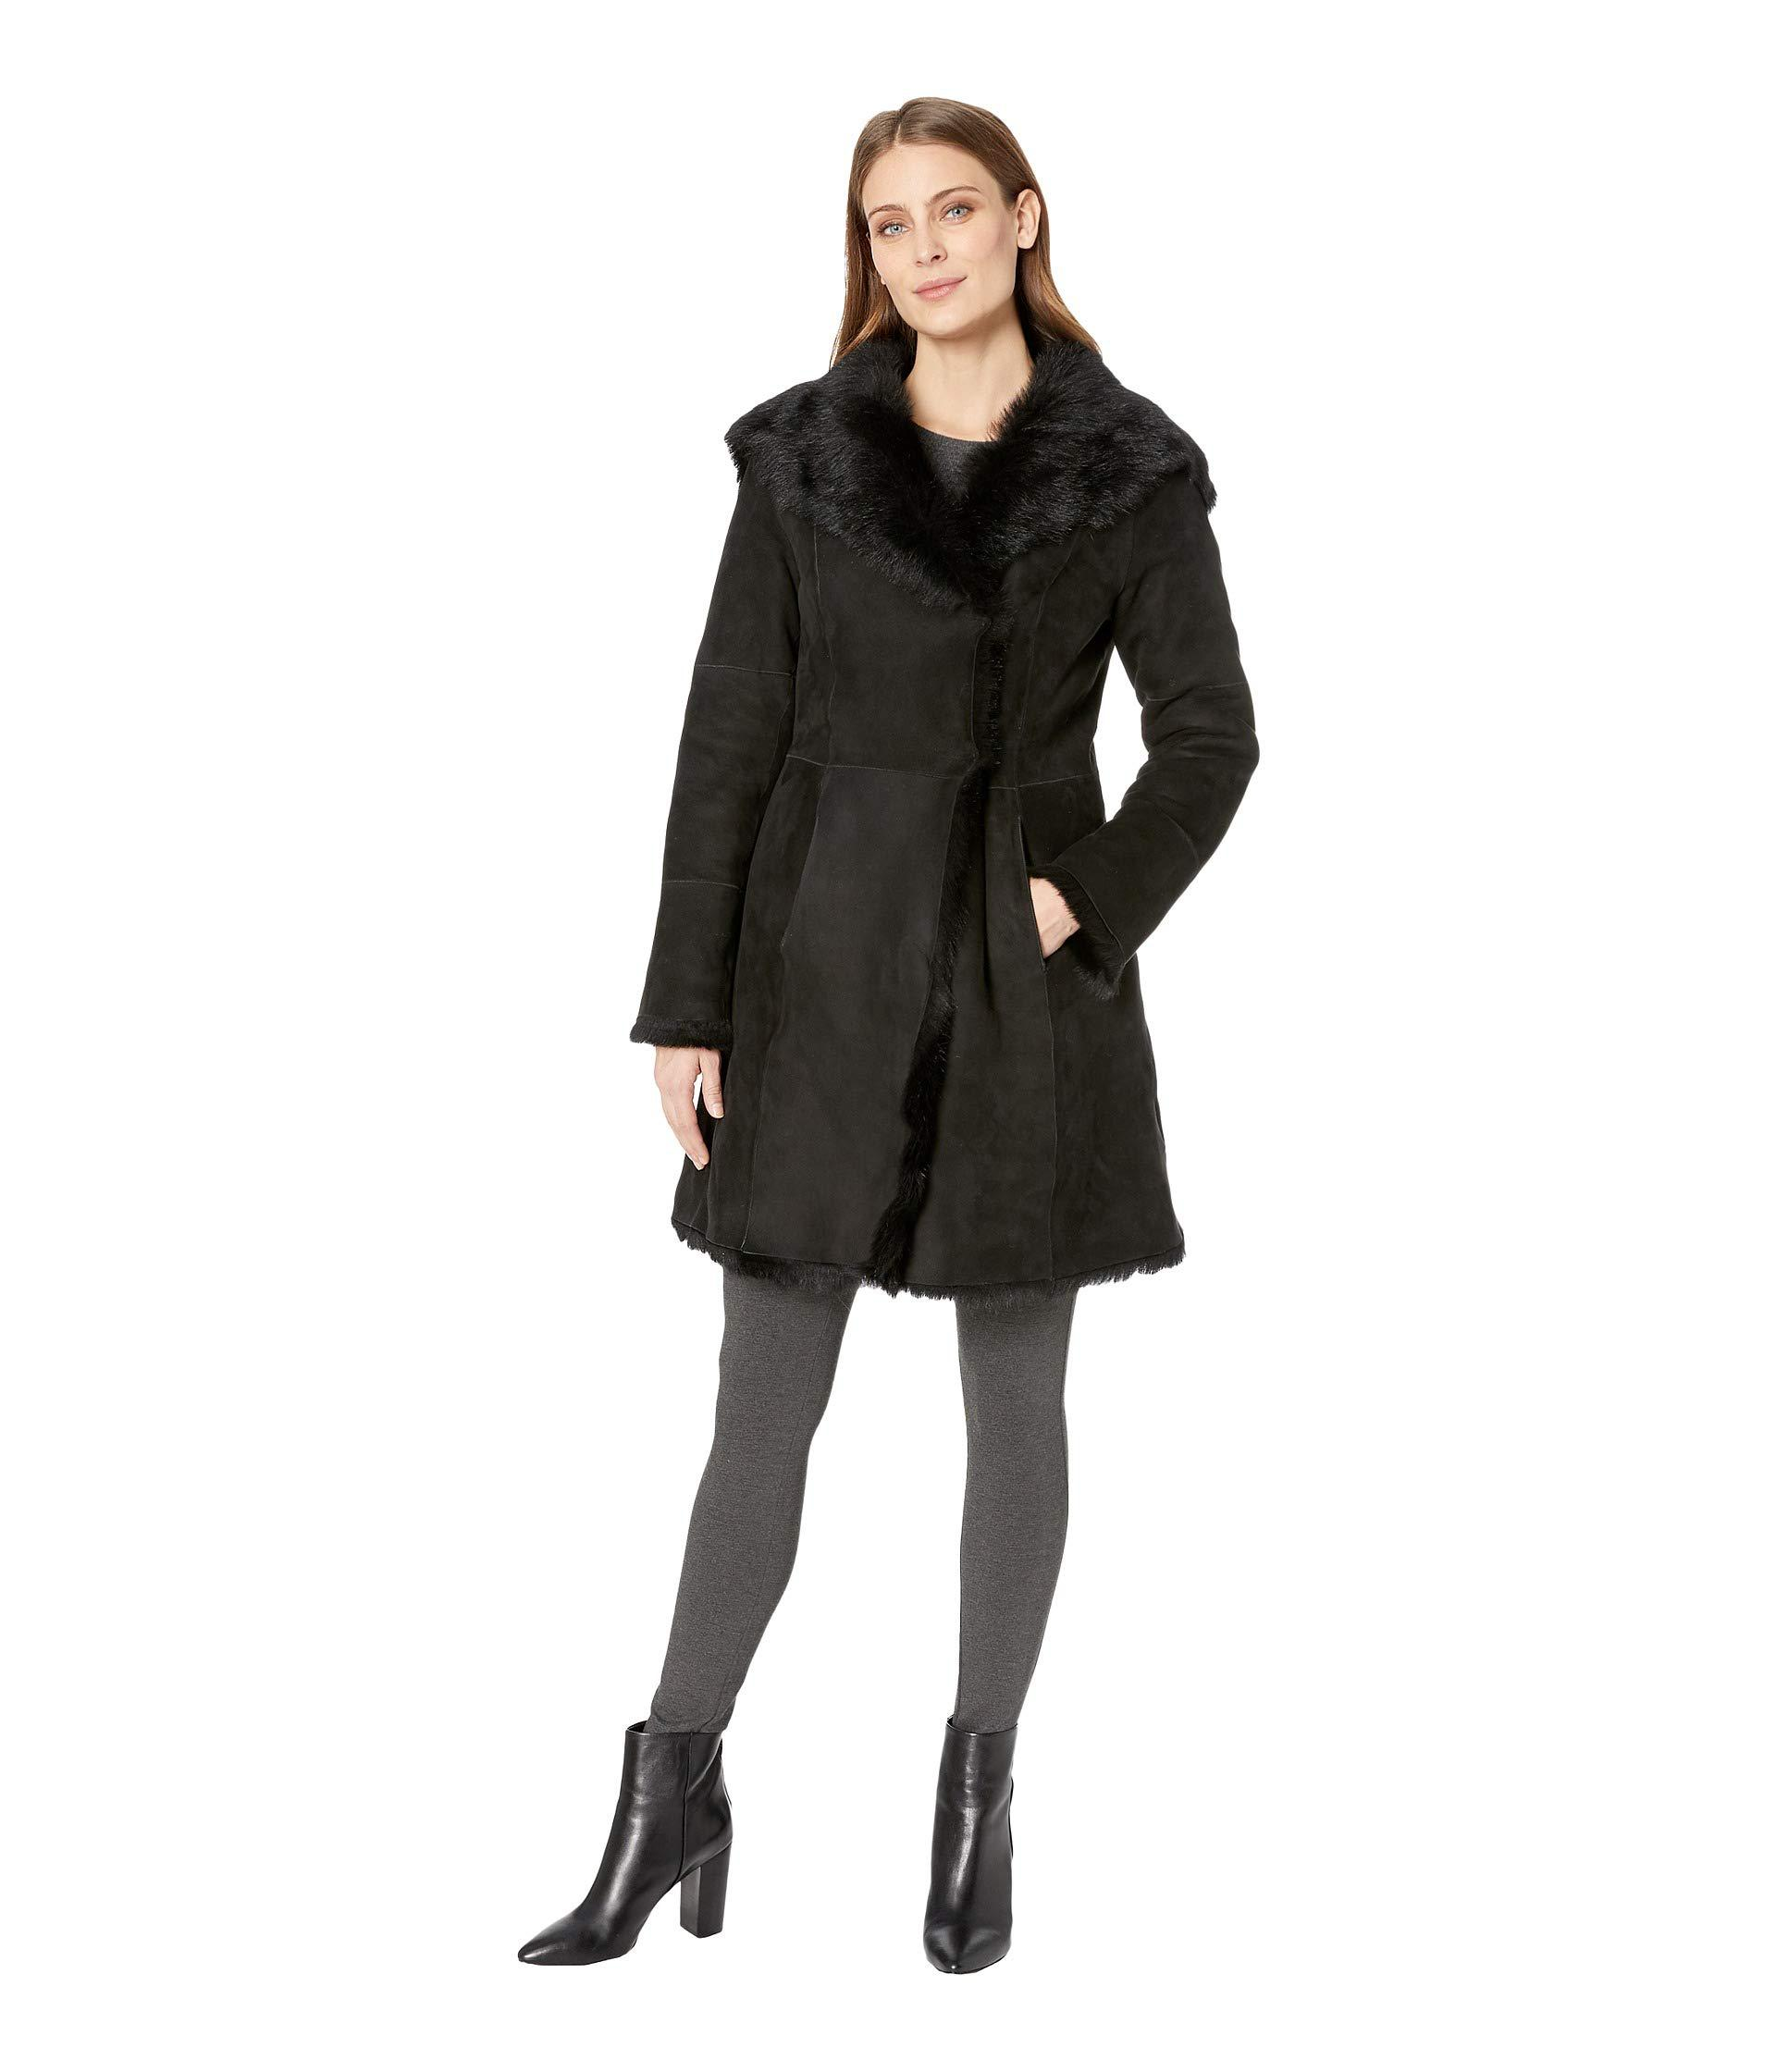 Lyst ugg vanesa toscana shearling coat chestnut womens coat jpg 1920x2240 Uggs  chestnut coat 02abb0edf